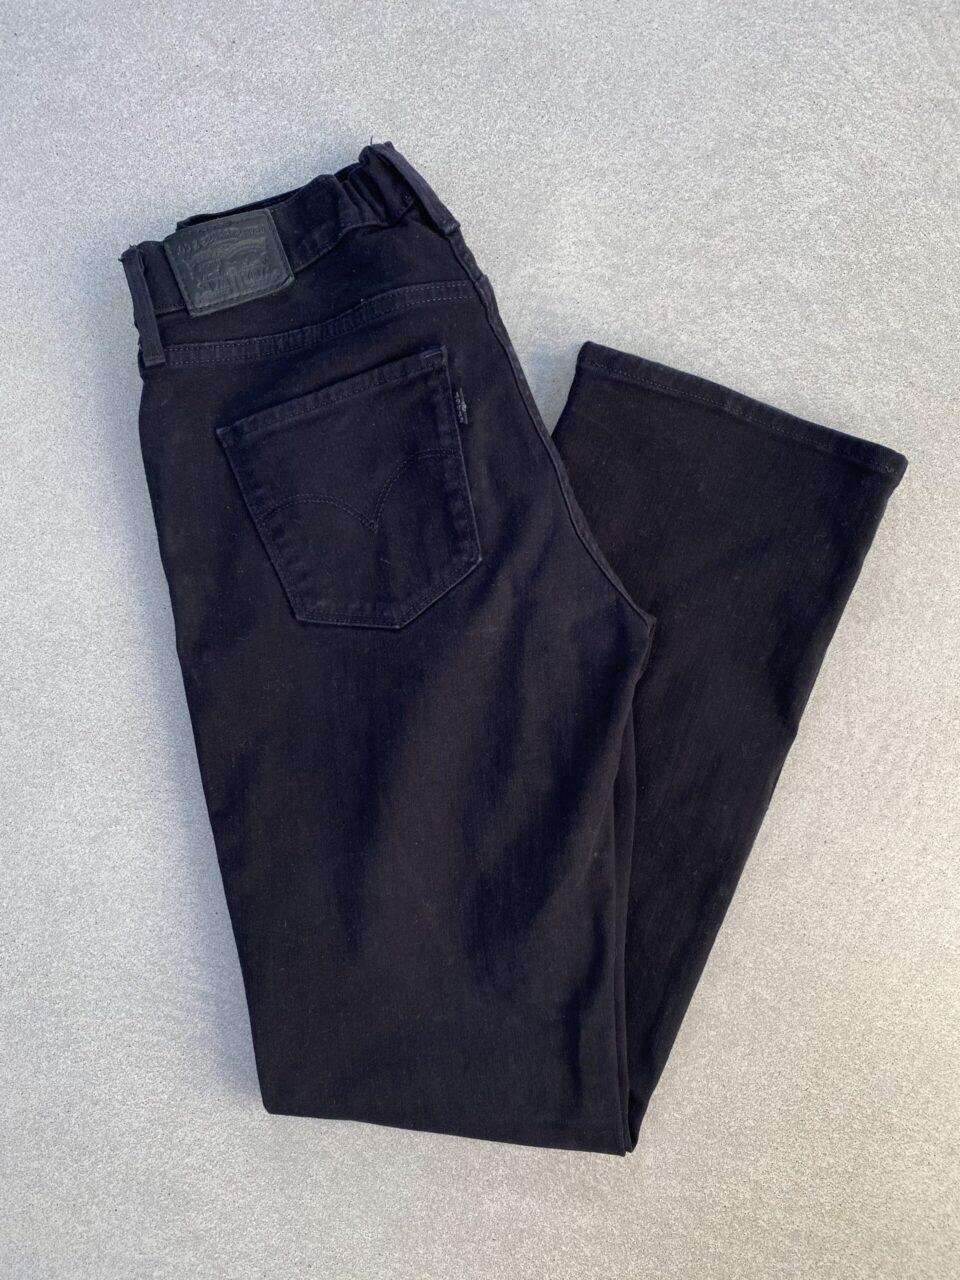 Levi's Jeans Zwart